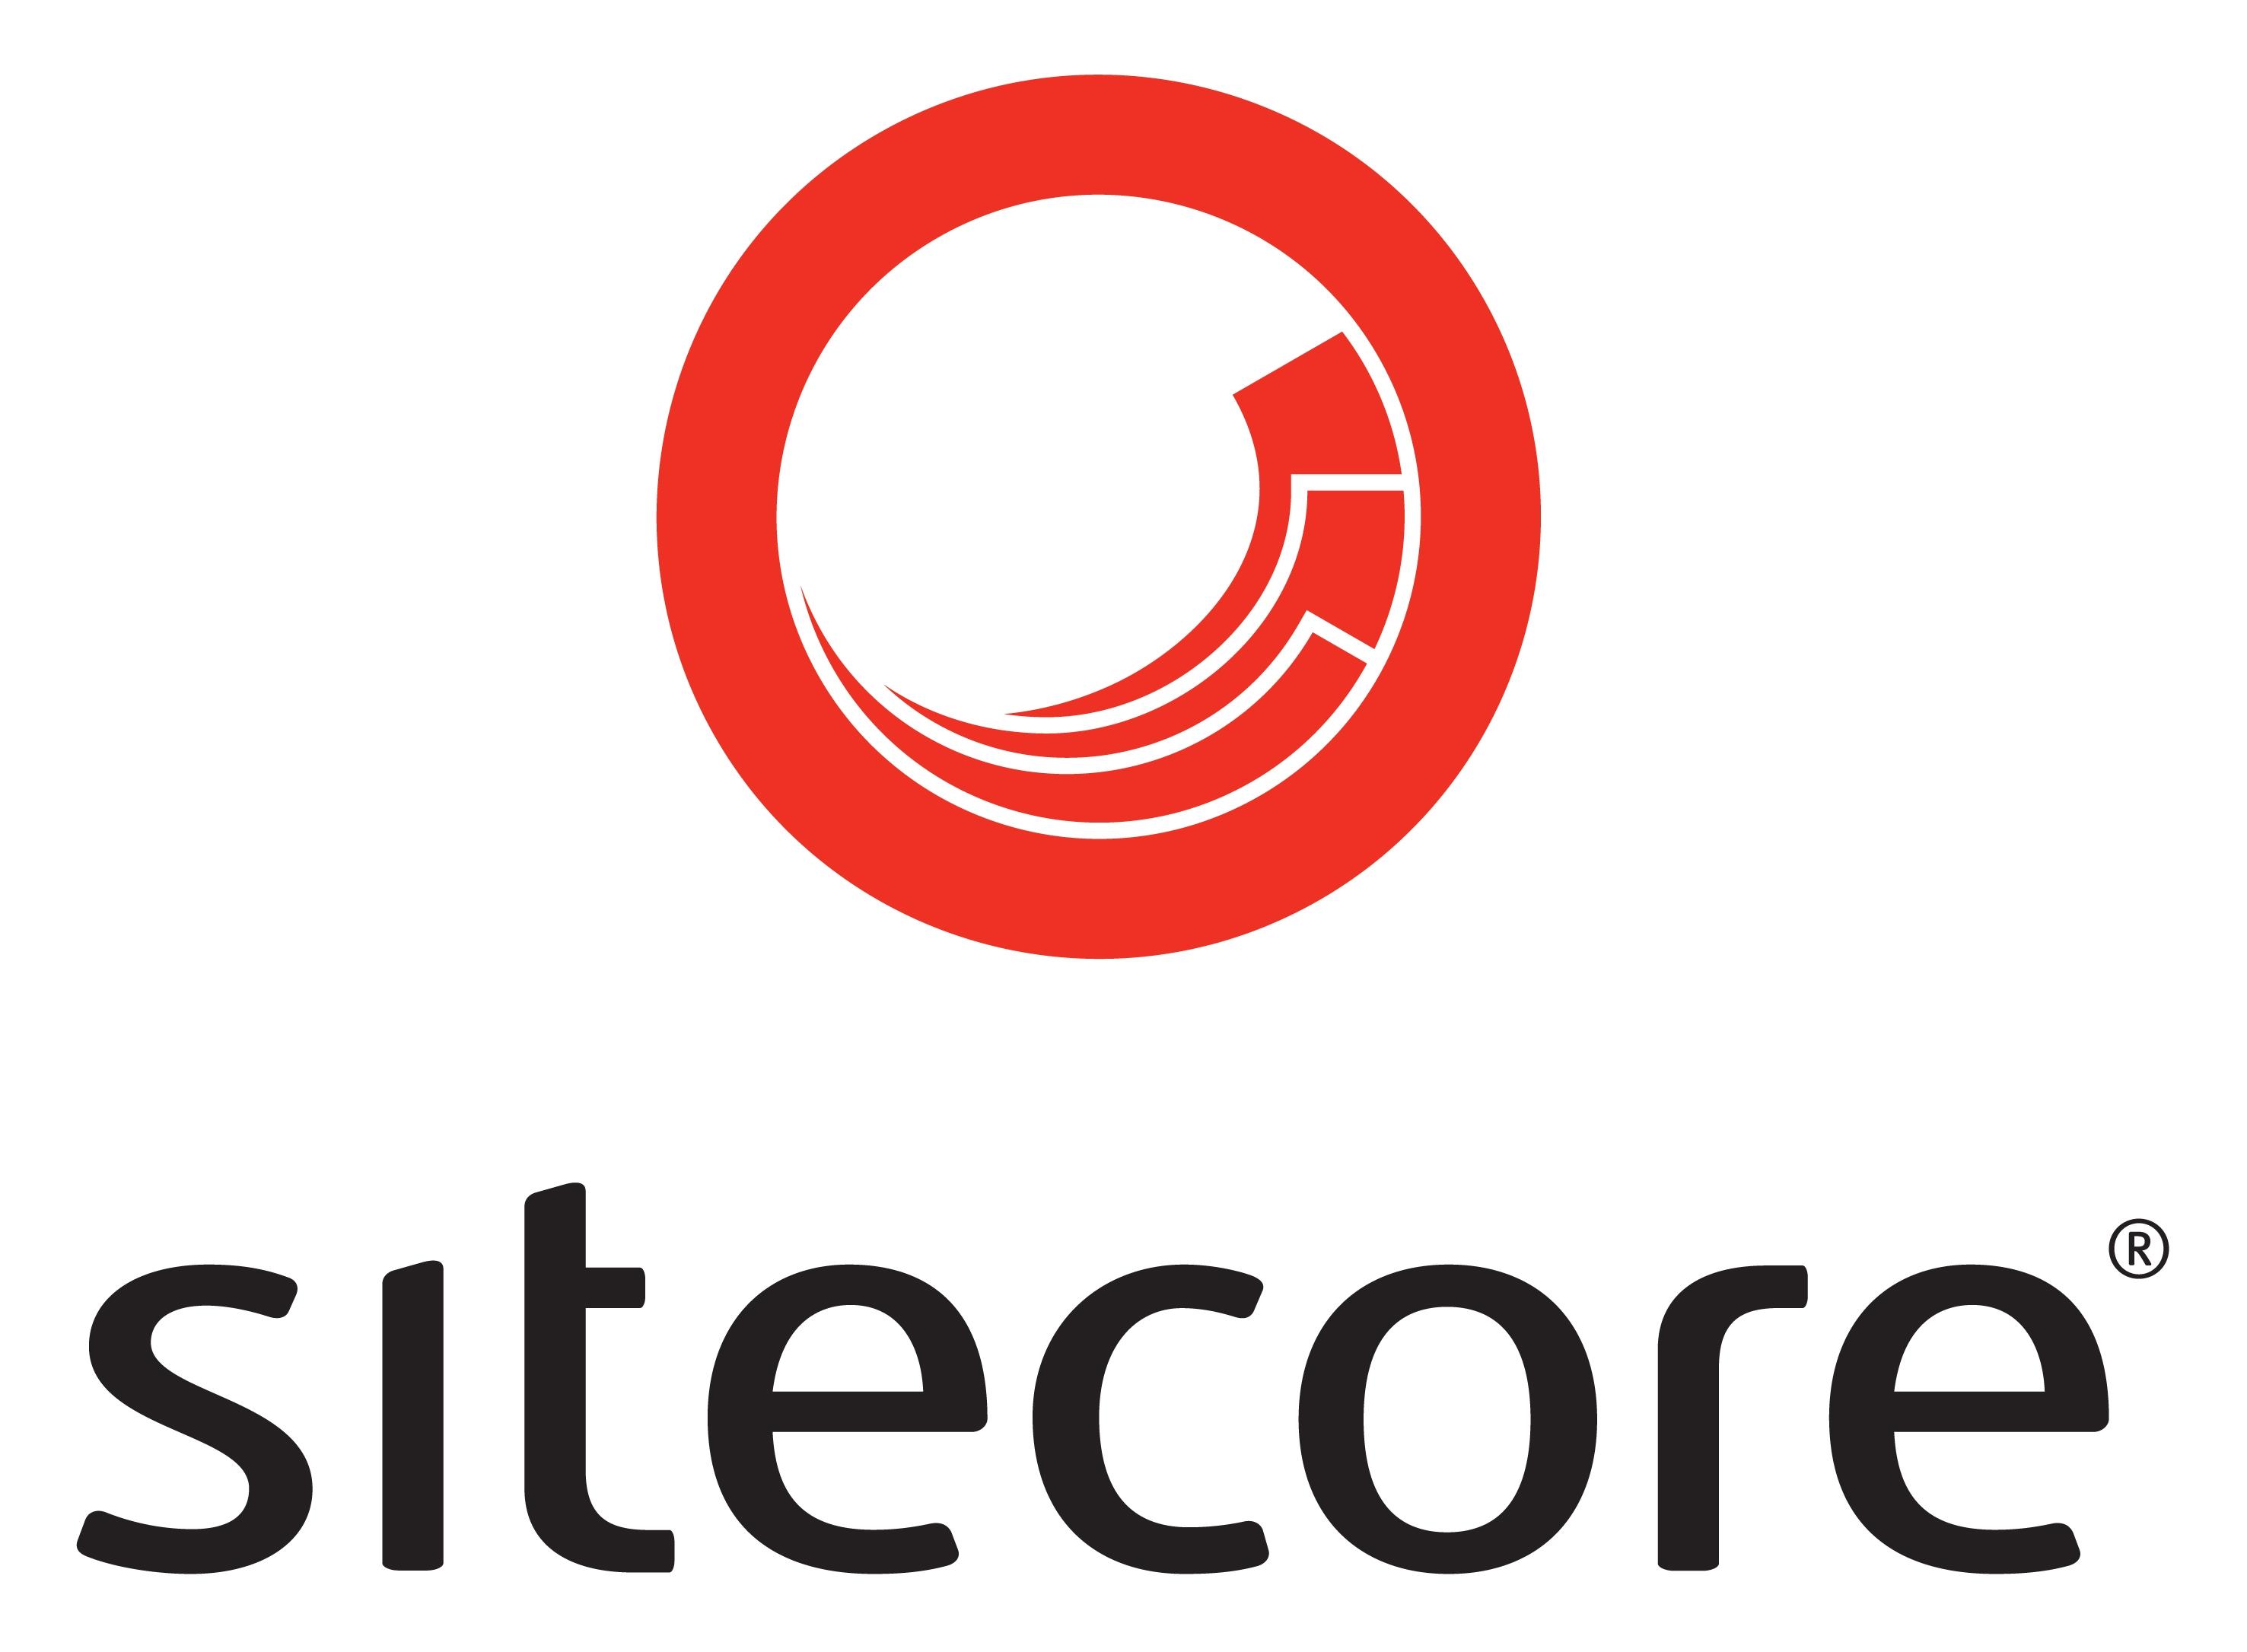 Sitecore-opdrachtgever-van-lyncwise-executive-search-&-interim